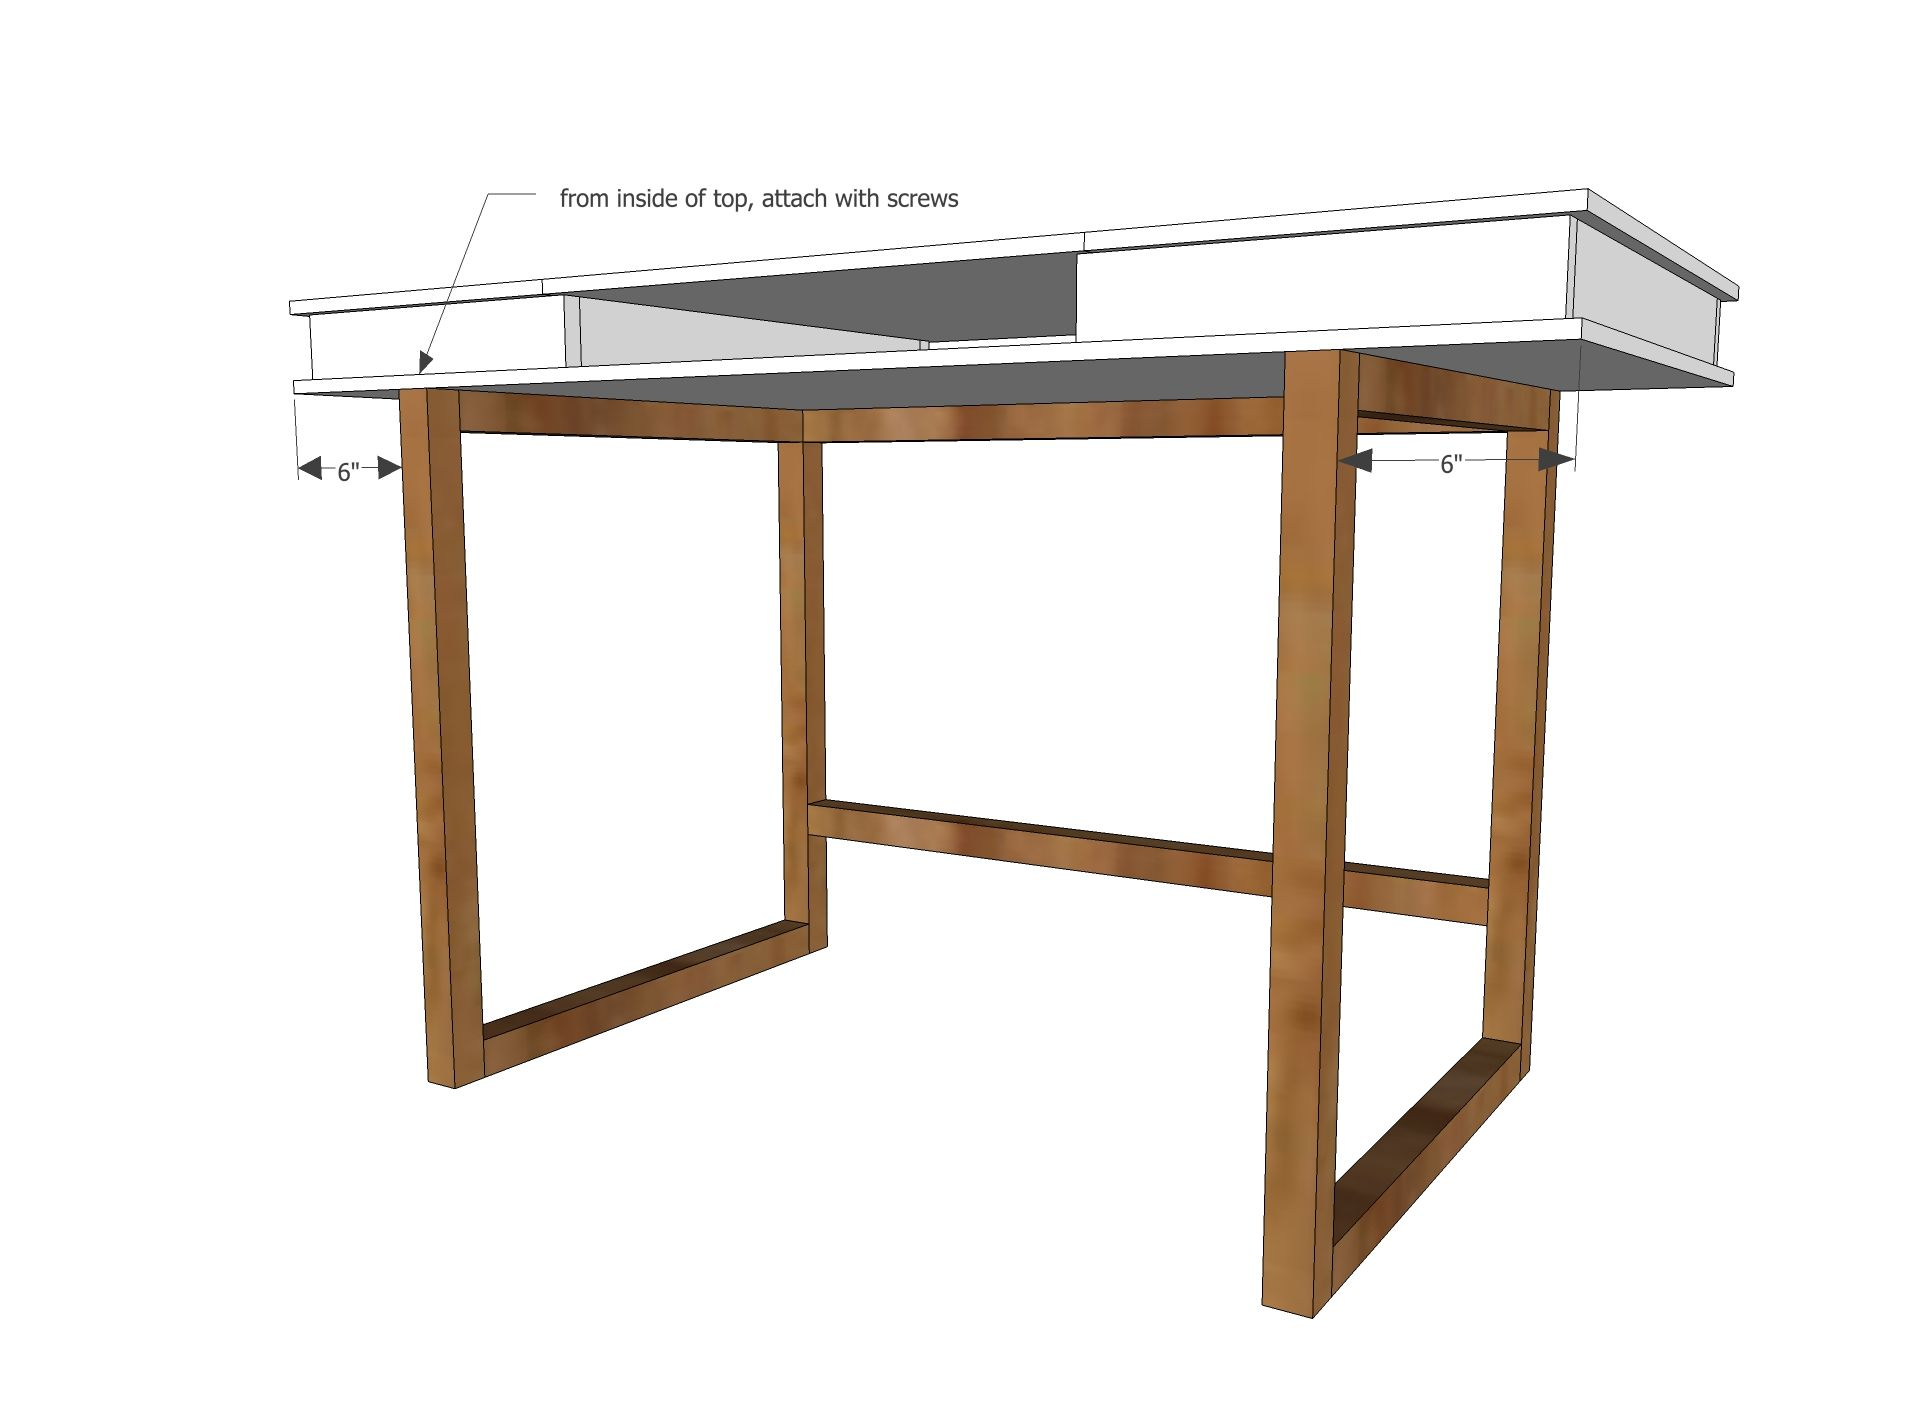 Ana white build a modern 2x2 desk base for build your for Desk building plans